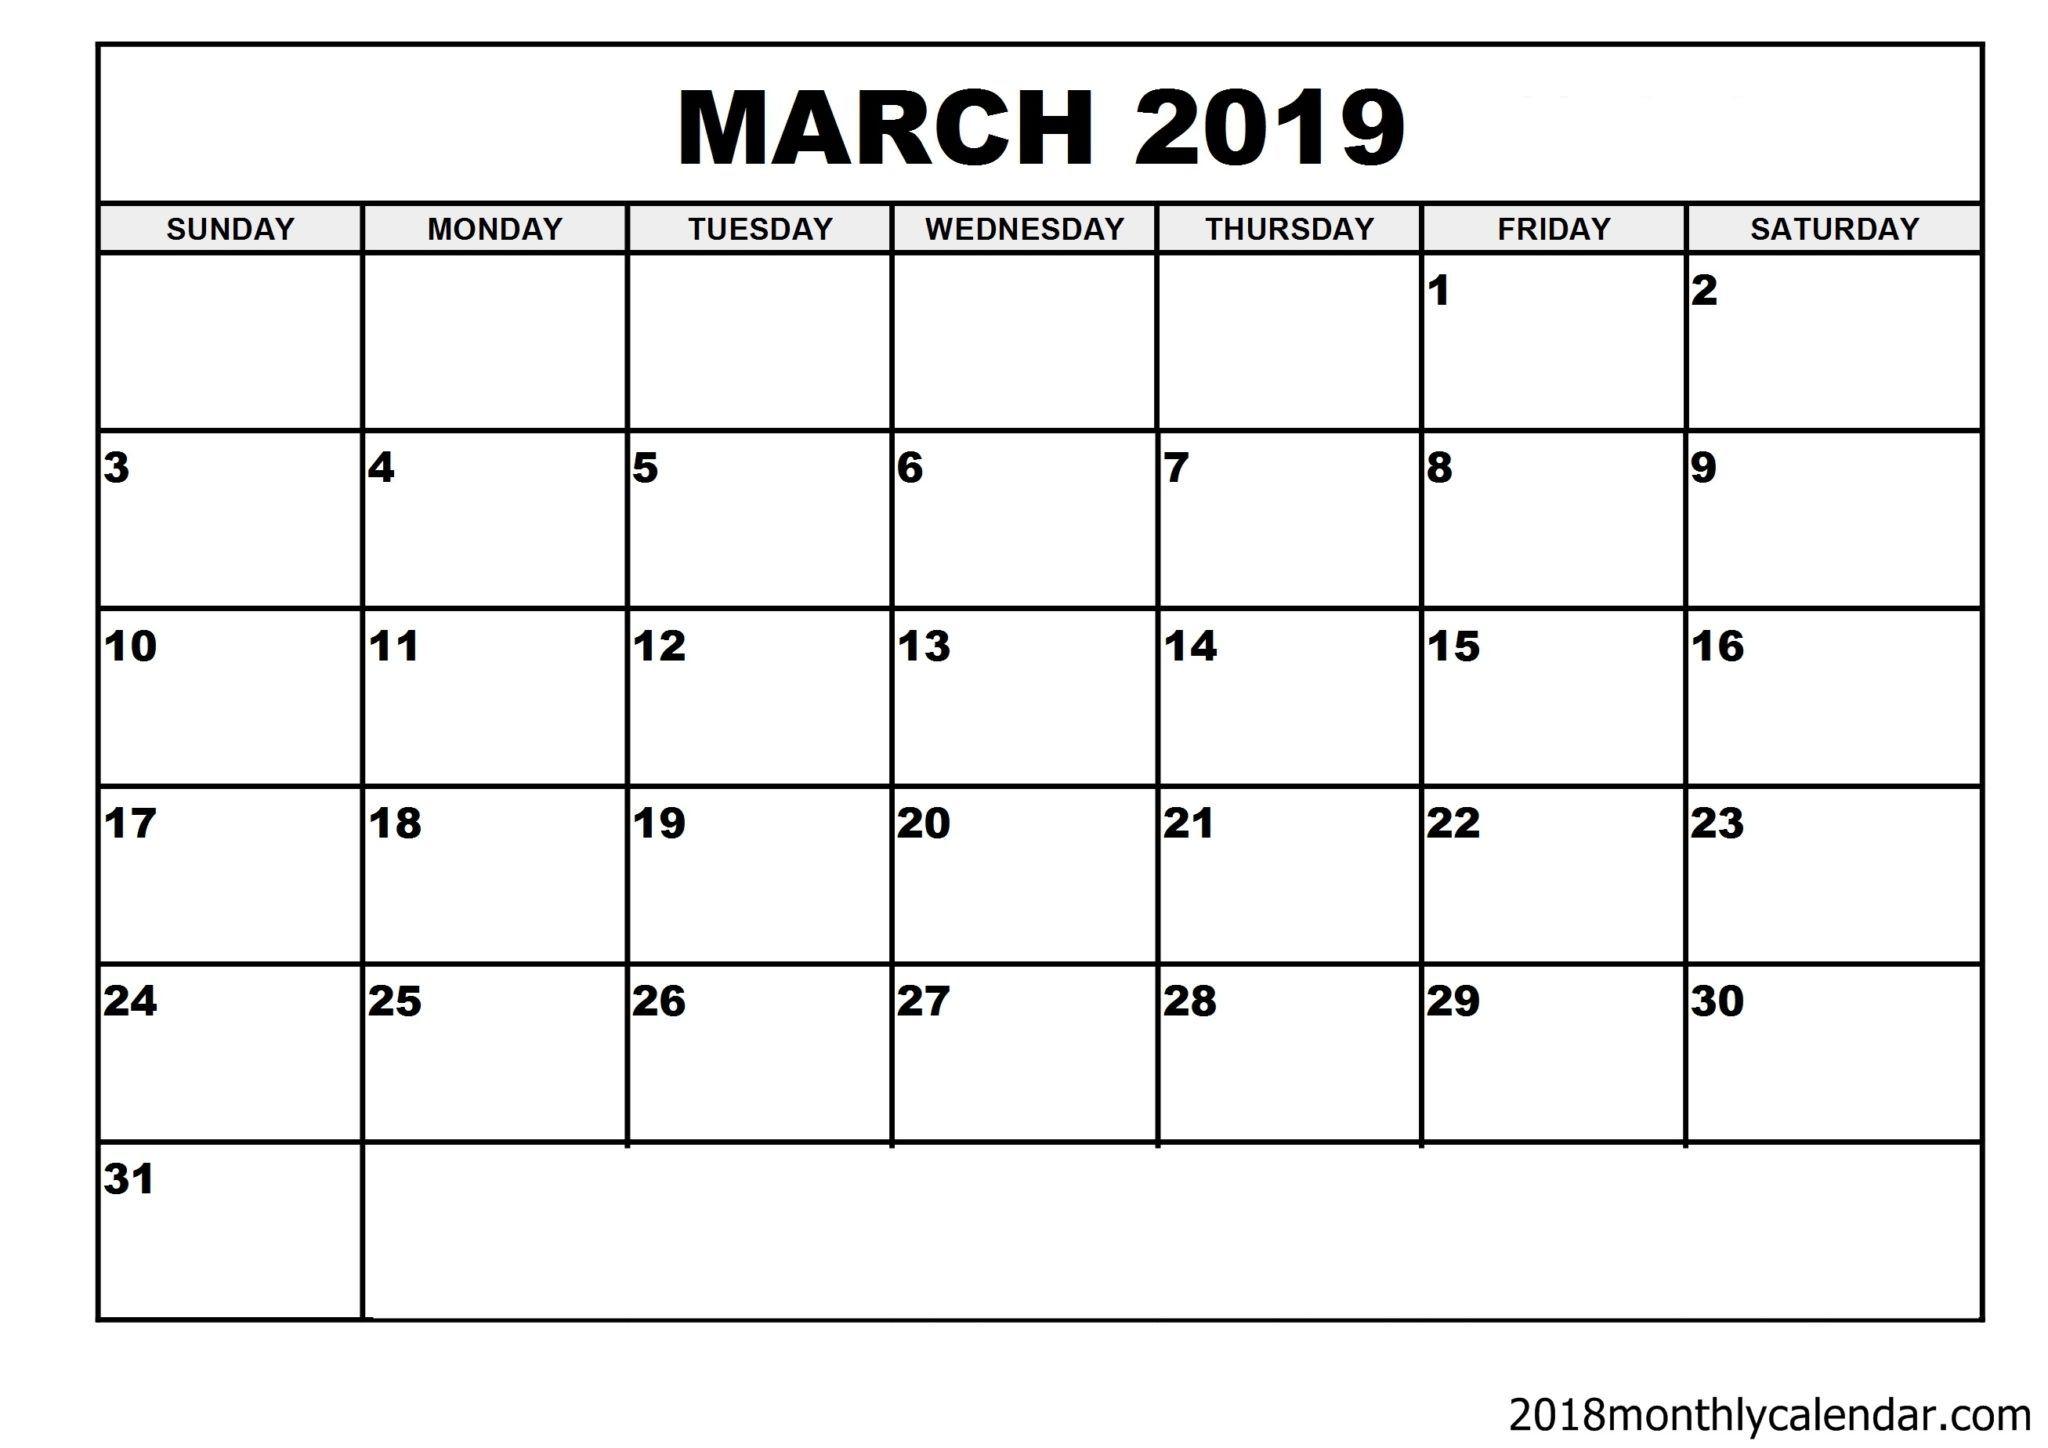 Download March 2019 Calendar – Blank Template - Editable Calendar intended for Calendar Template Fillable Pdf